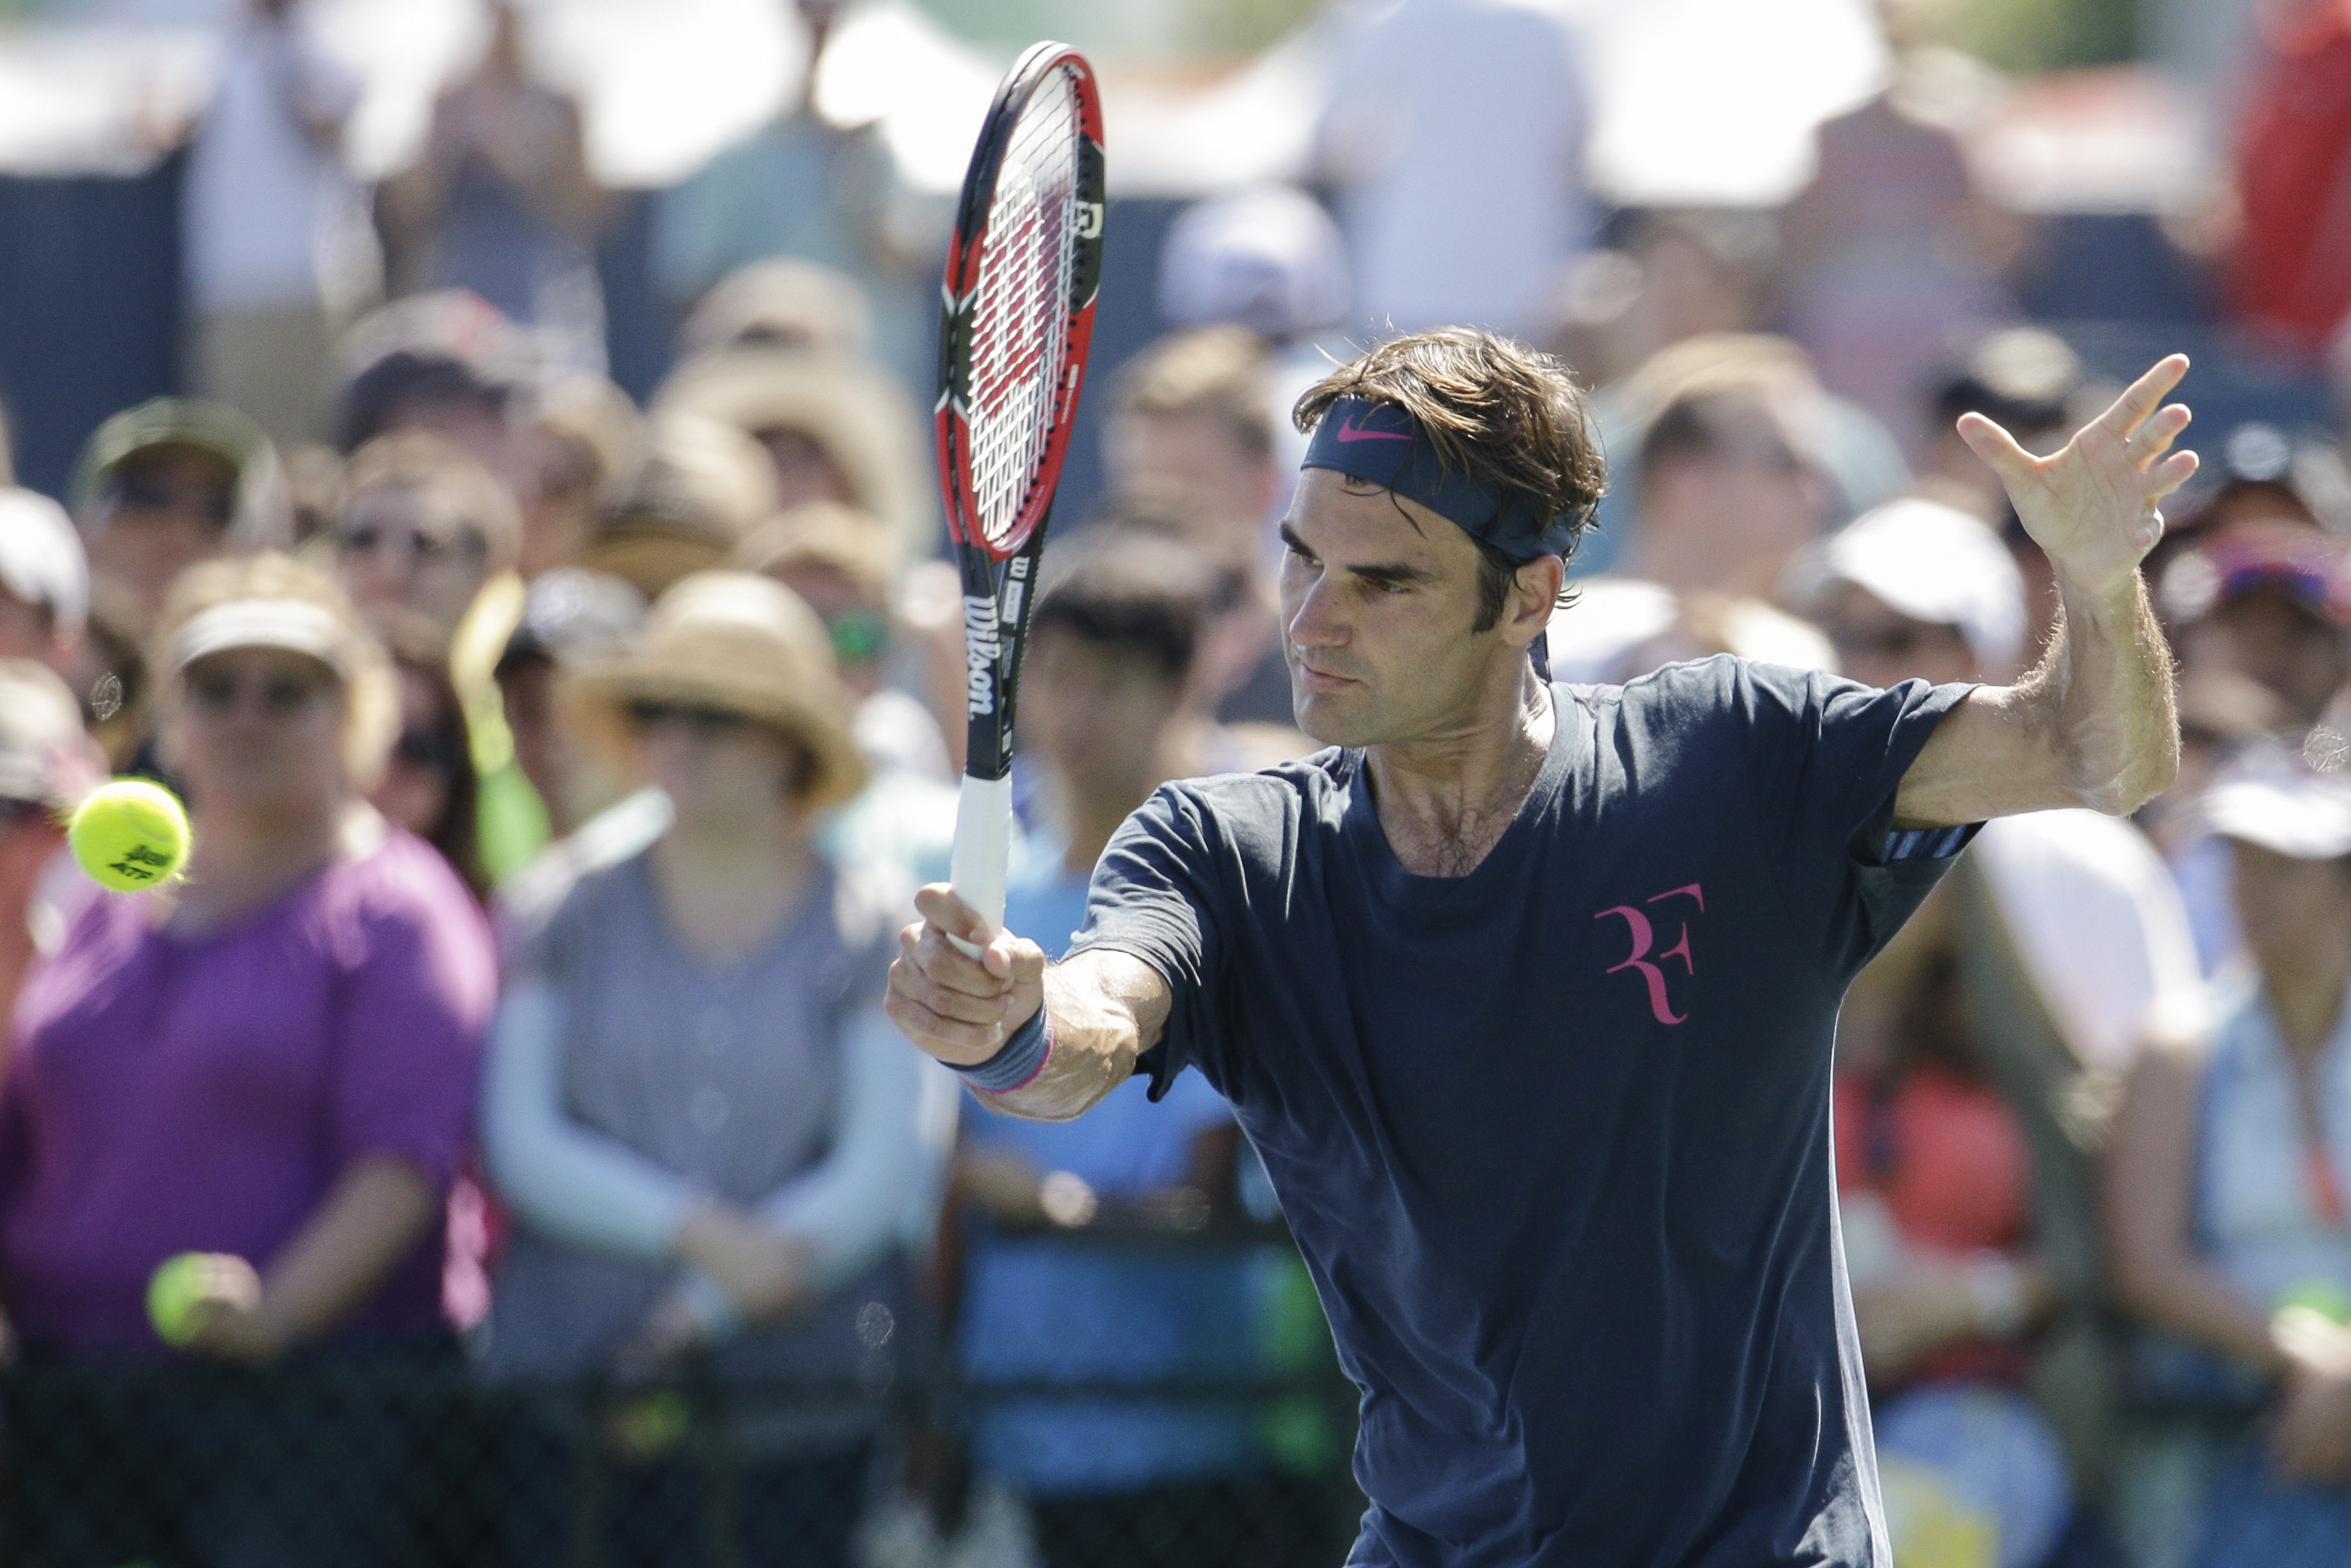 Roger Federer, of Switzerland, practices at the Western & Southern Open tennis tournament, Sunday, Aug. 16, 2015, in Mason, Ohio. (AP Photo/John Minchillo)